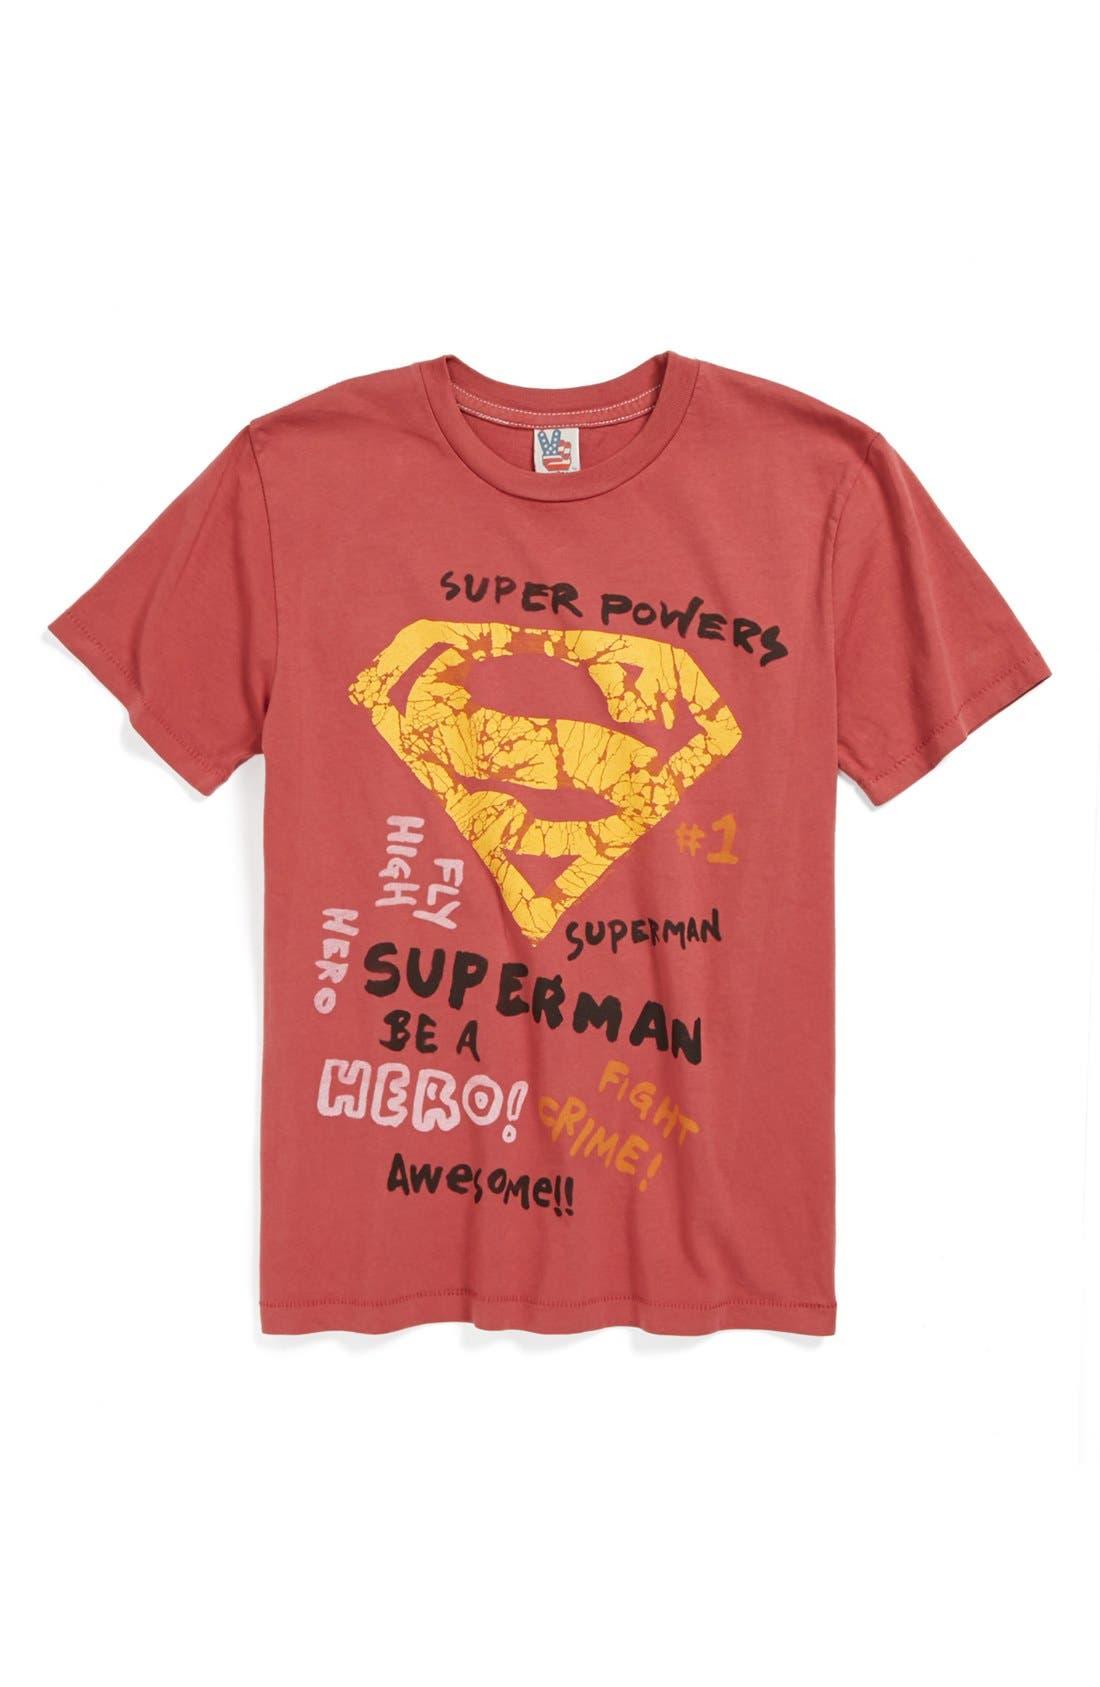 Alternate Image 1 Selected - Junk Food 'Superman' T-Shirt (Little Boys & Big Boys)